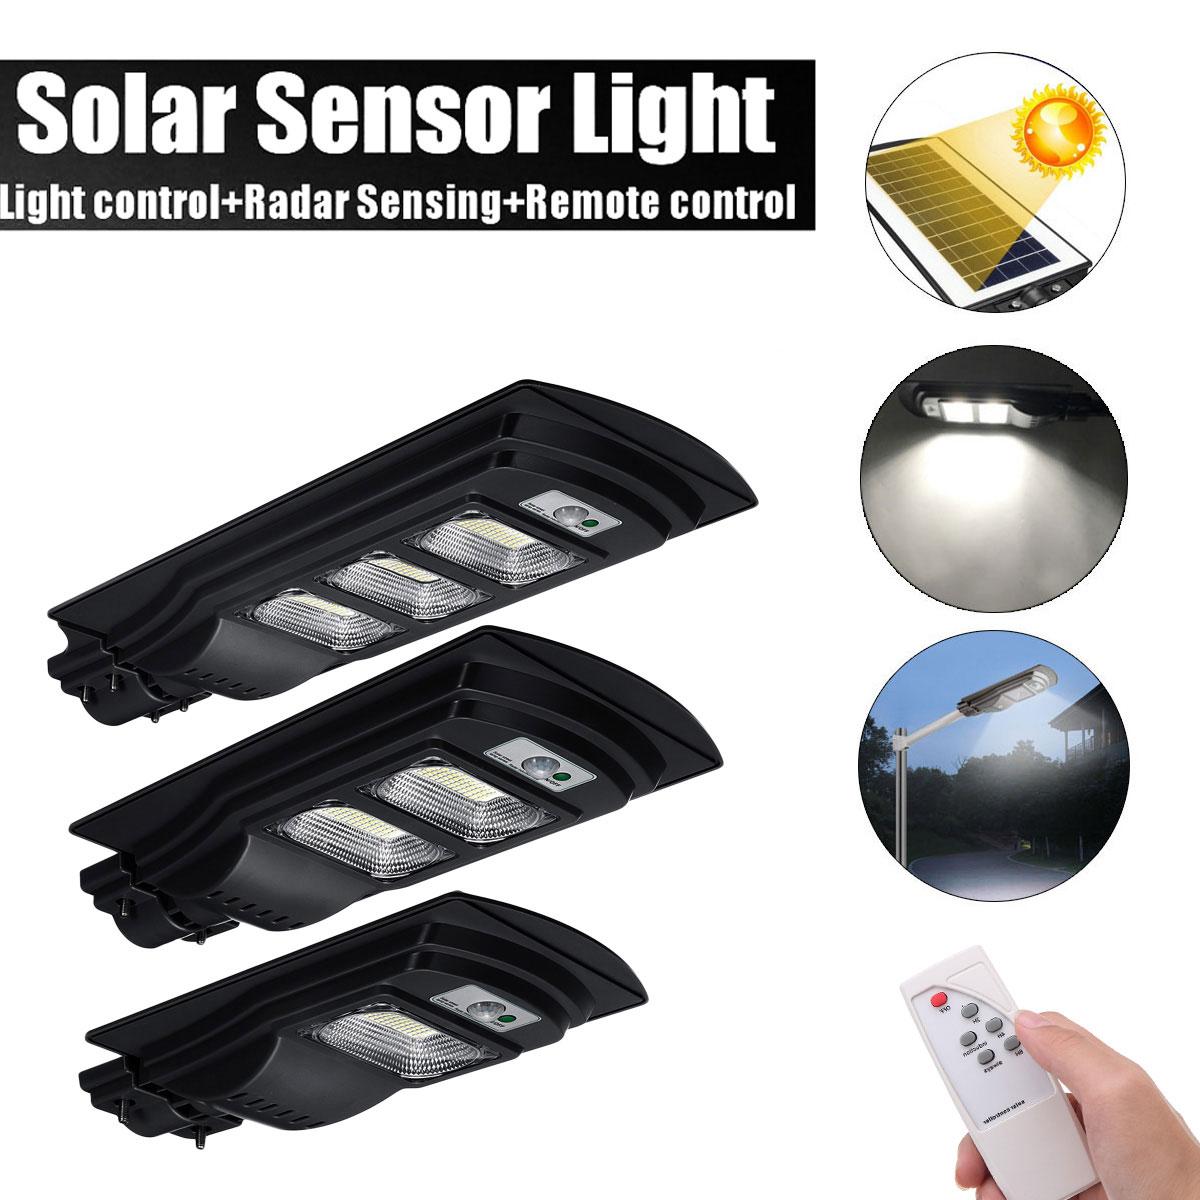 30W/600W/90W LED Solar Street Light Solar Light Radar PIR Motion Sensor Wall Timing Lamp+Remote Comtrol Waterproof For Plaza